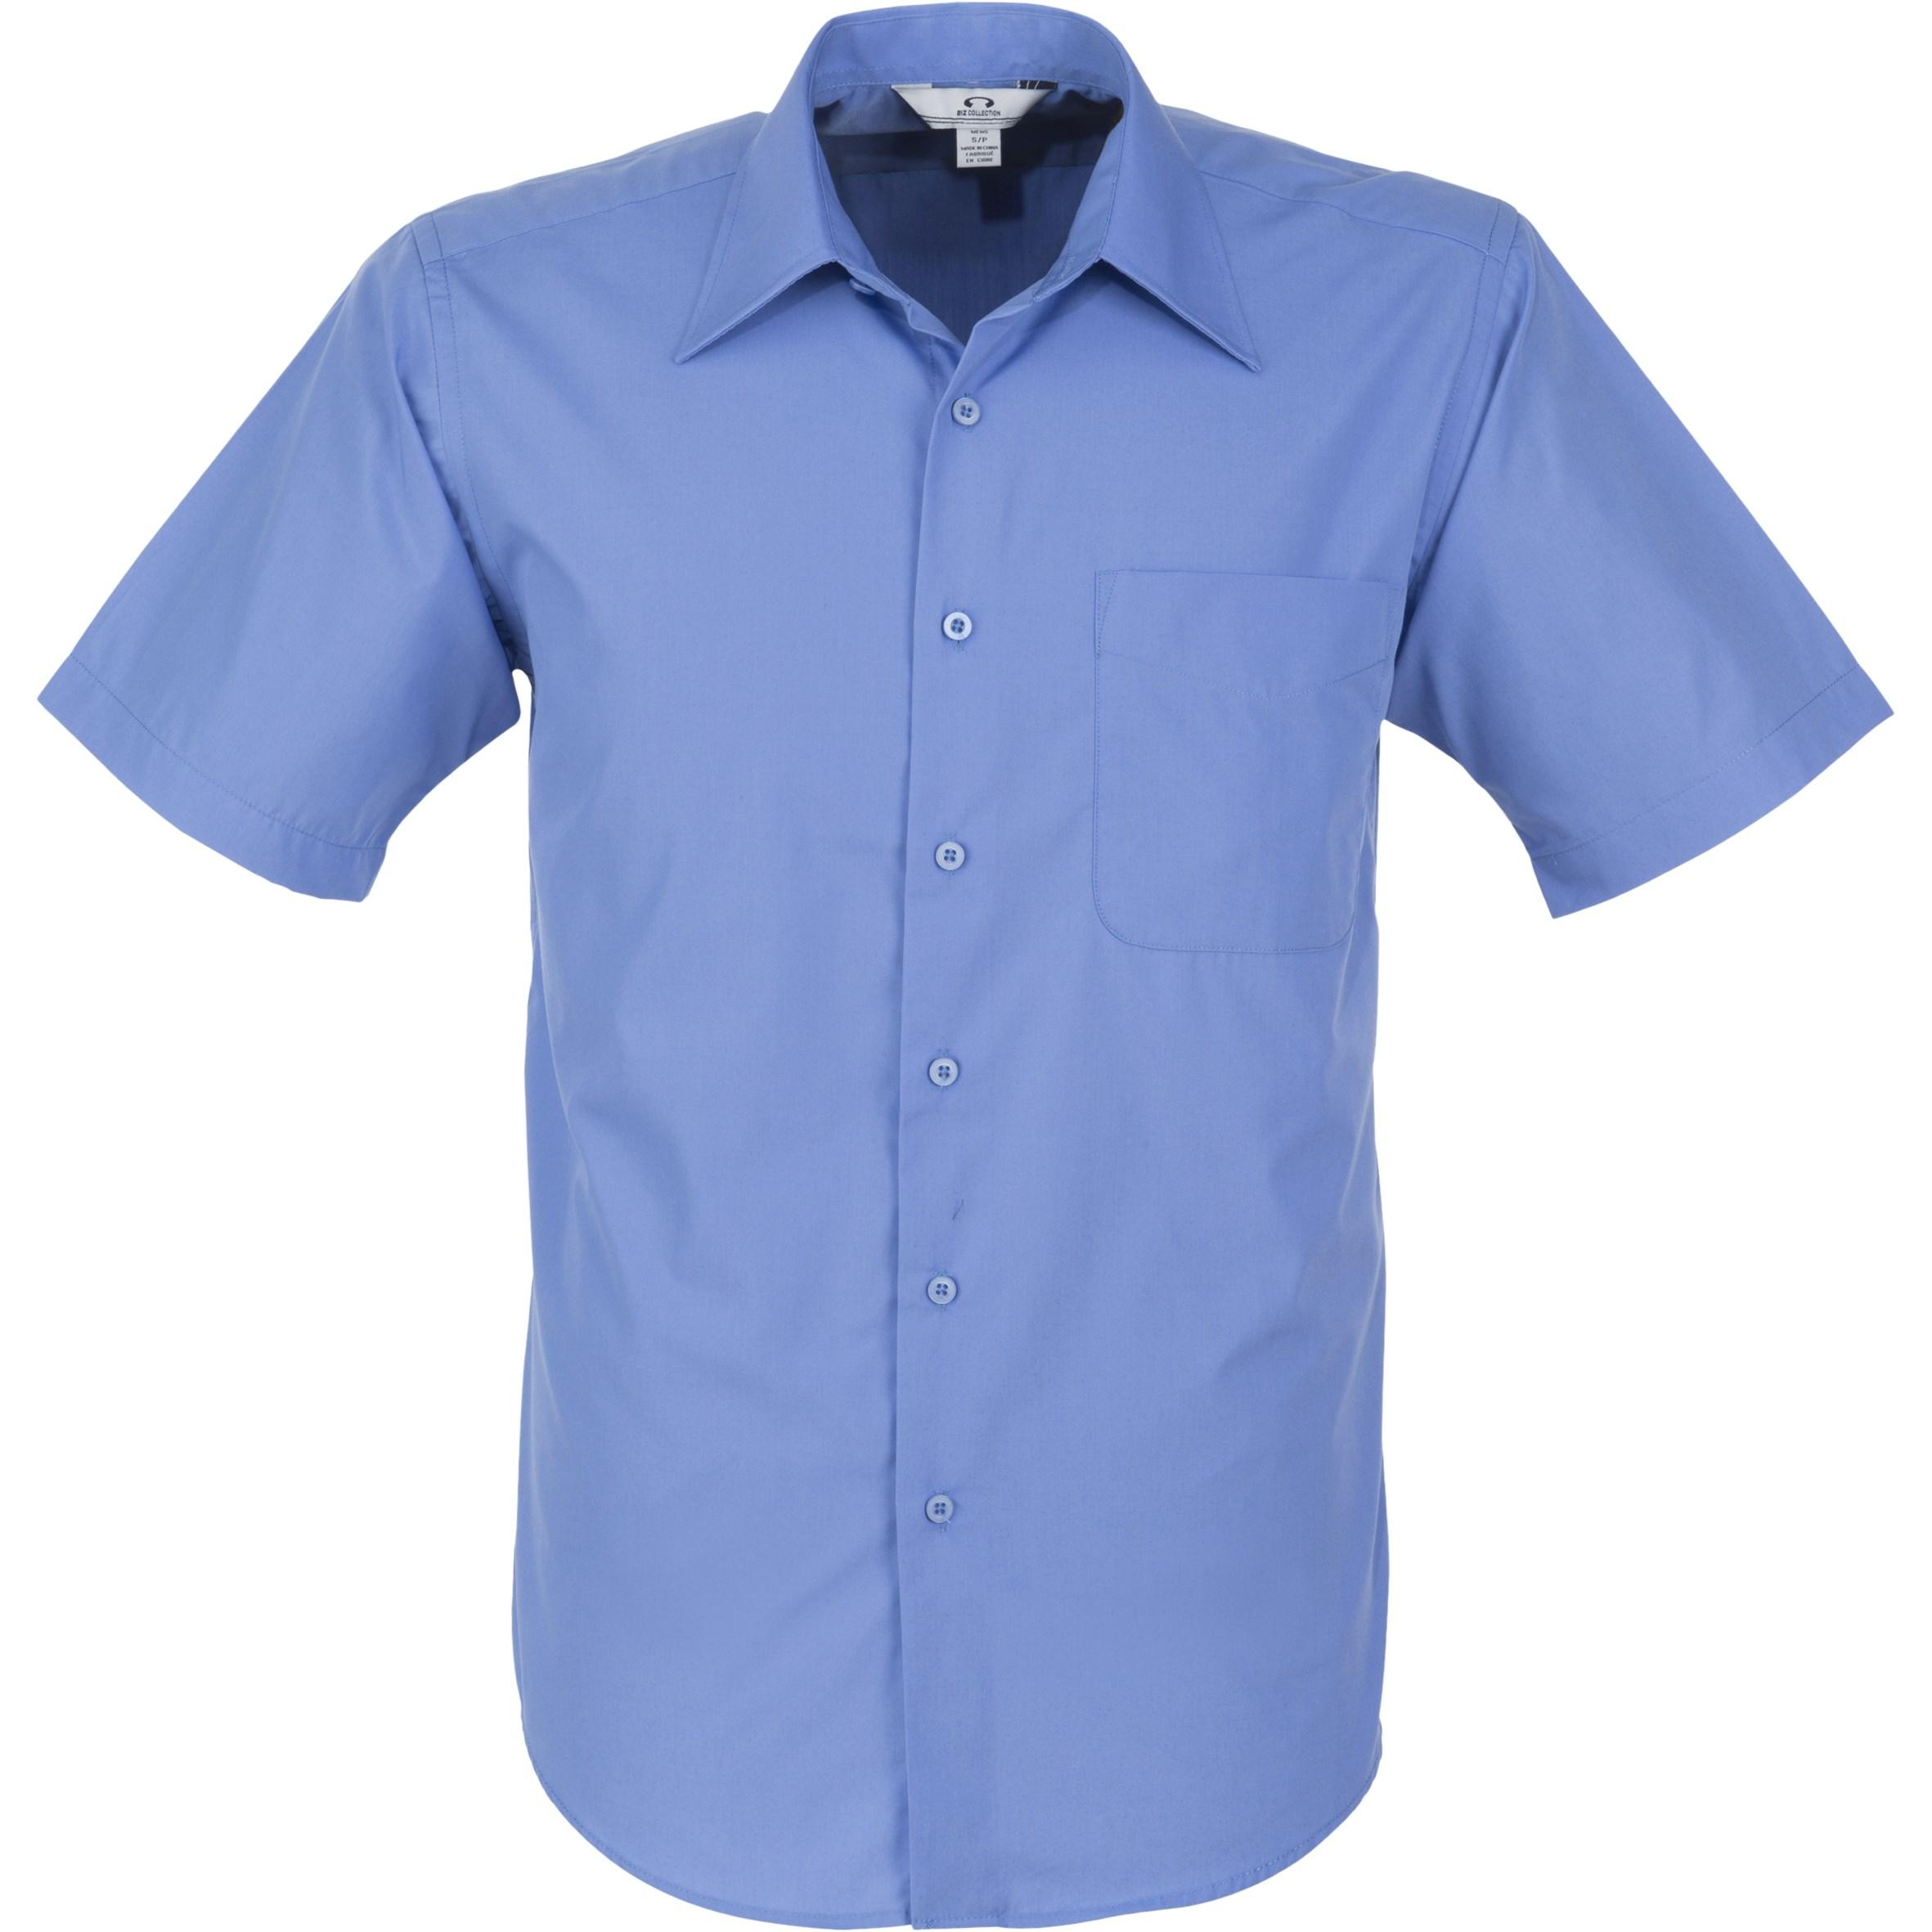 Mens Short Sleeve Metro Shirt - Blue Only